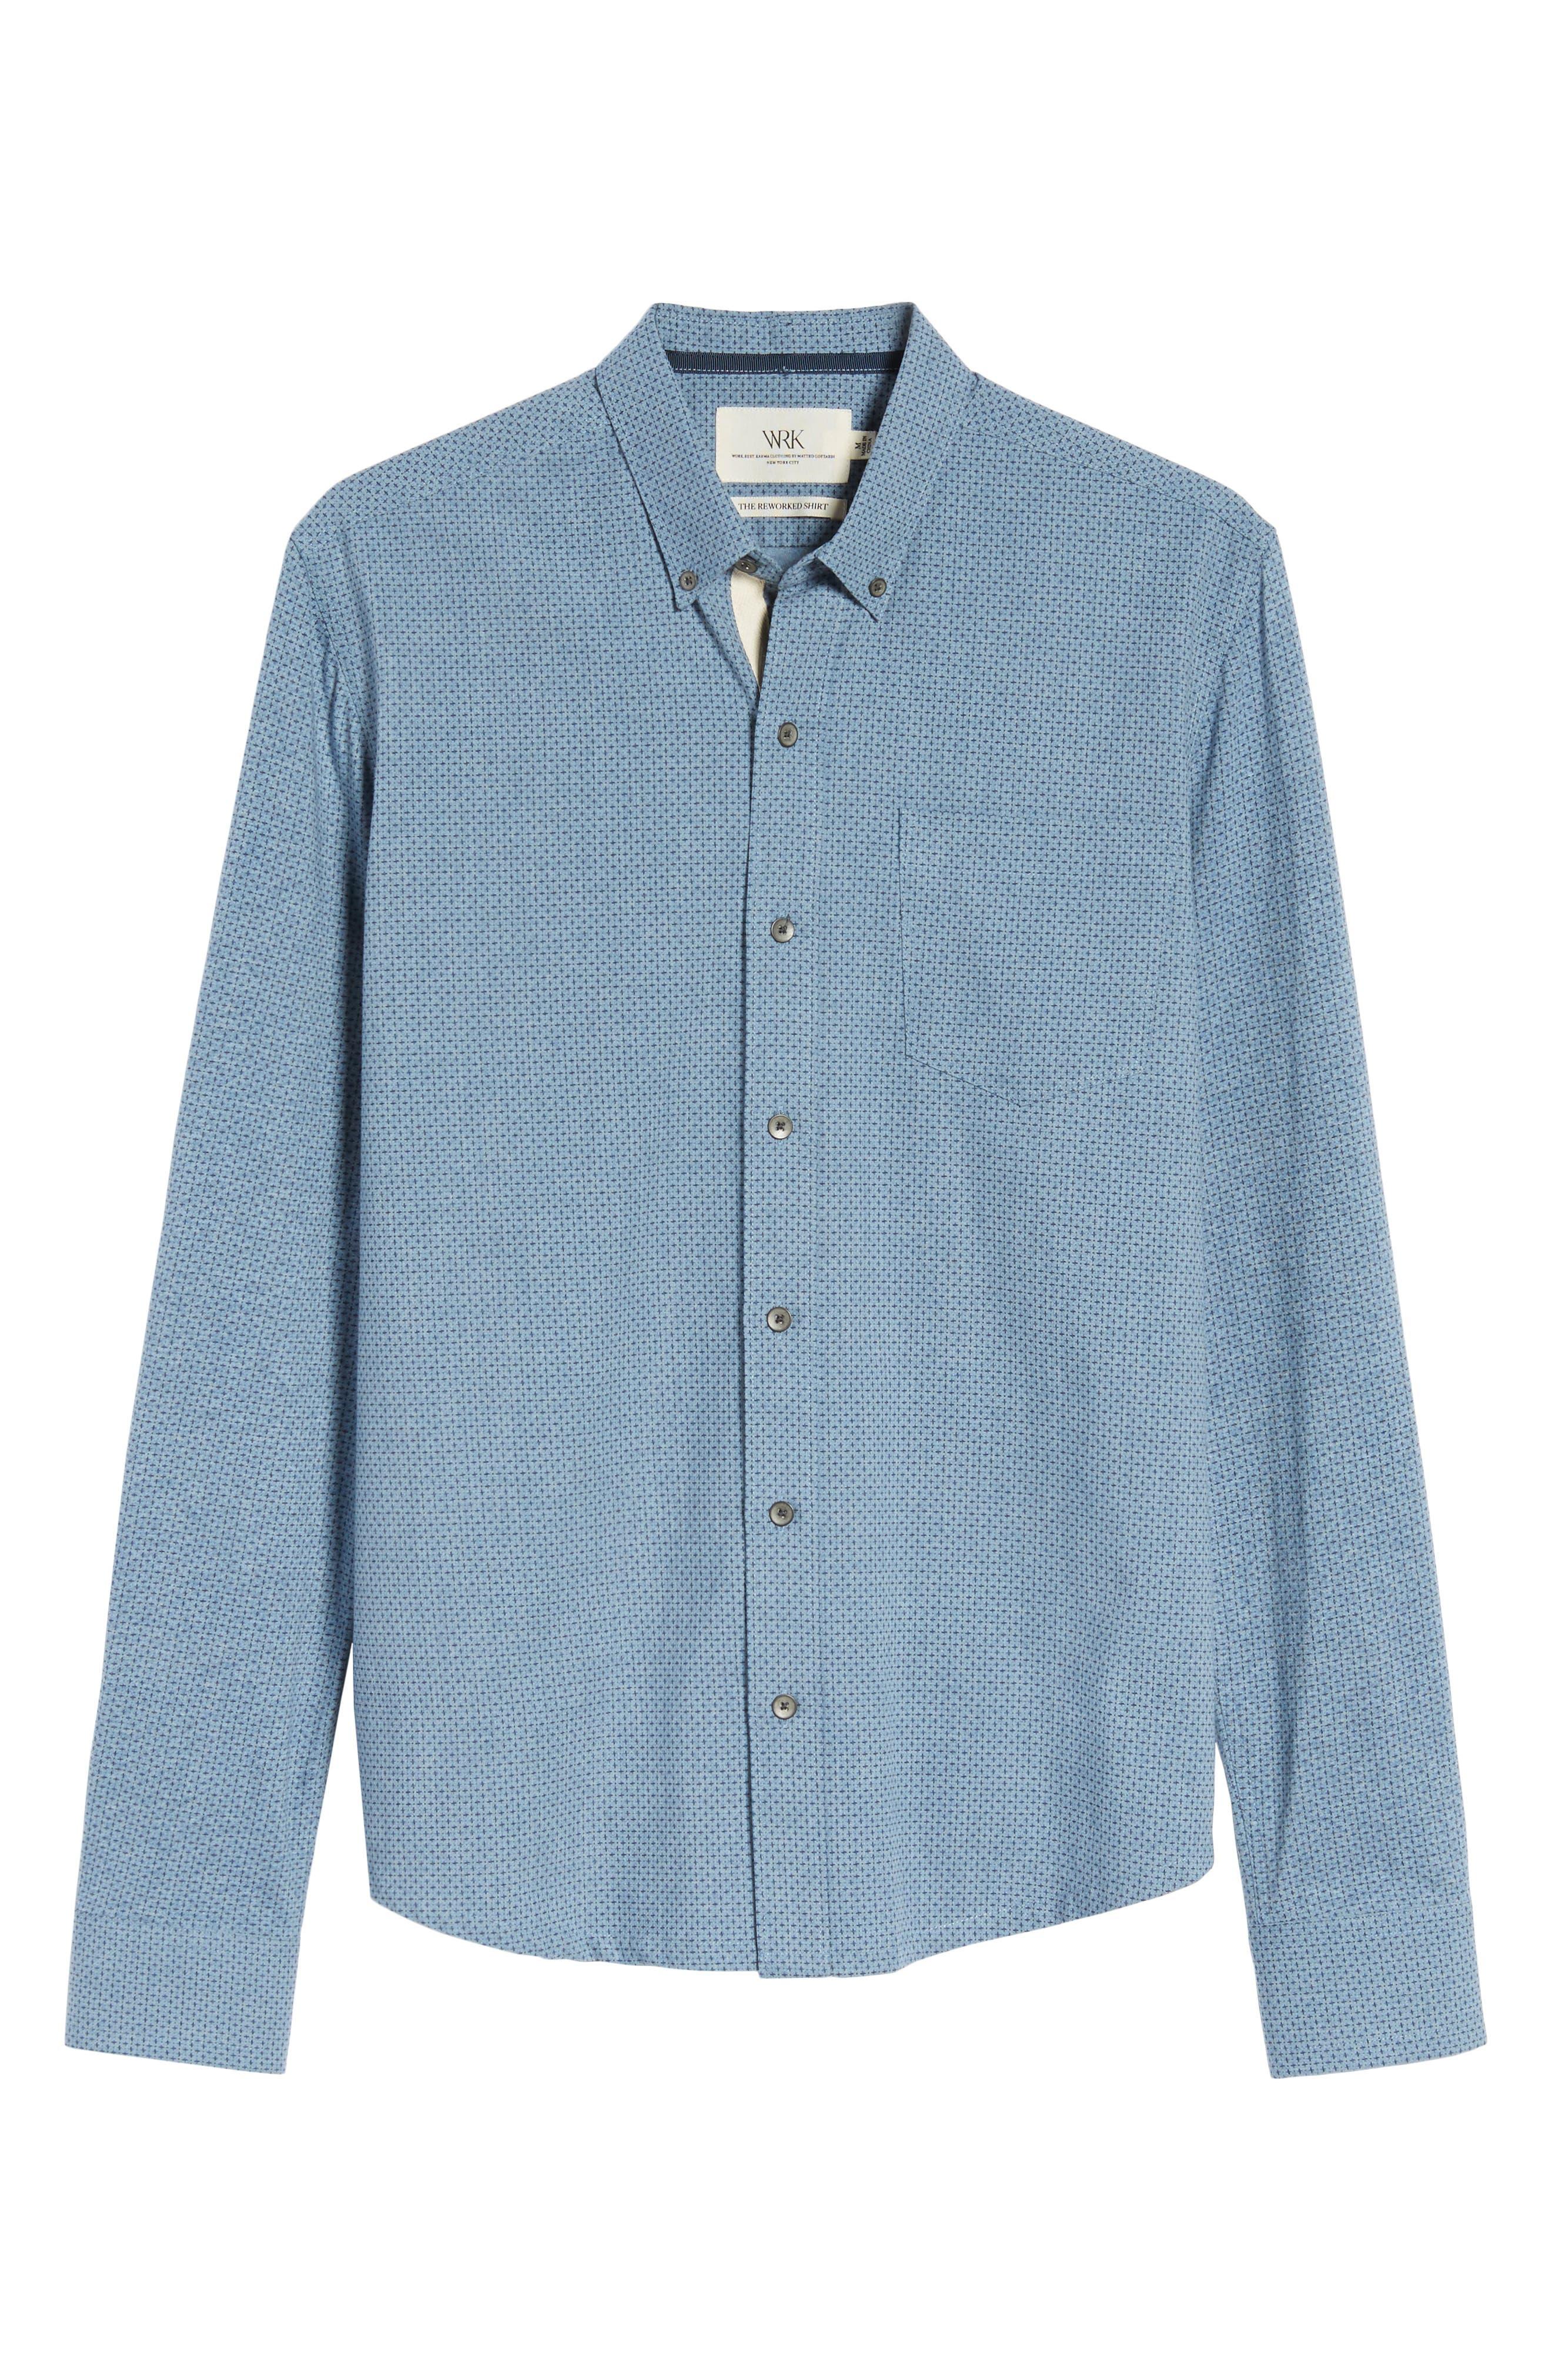 Reworked Patterned Sport Shirt,                             Alternate thumbnail 5, color,                             Blue